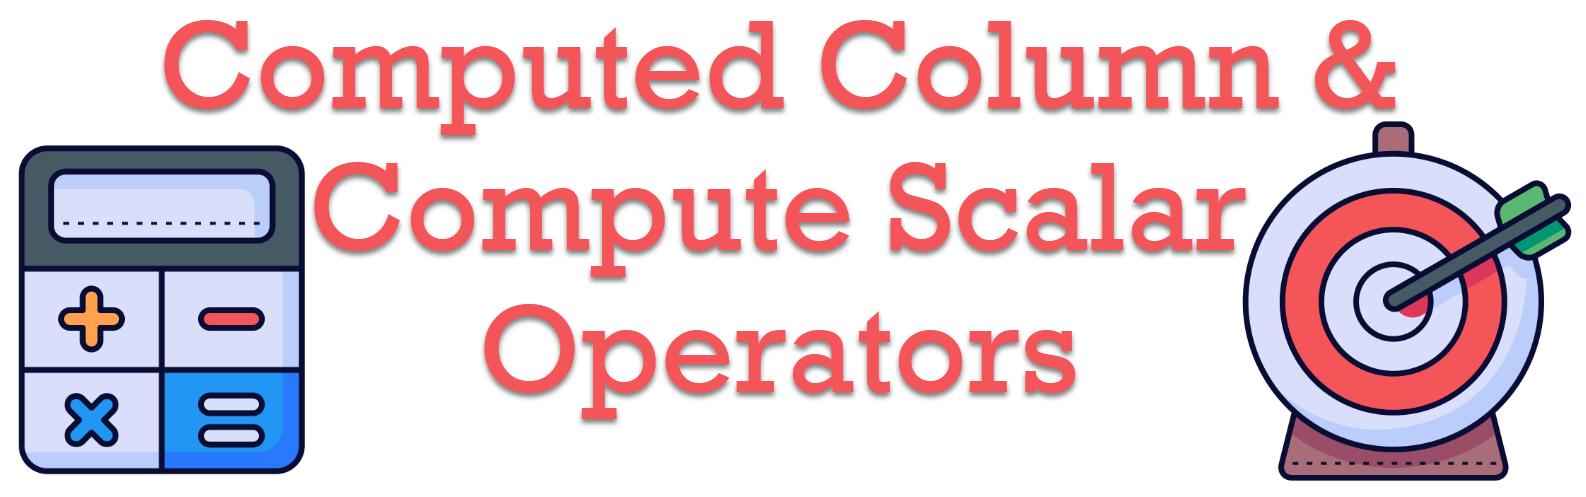 Compute Scalar Operators